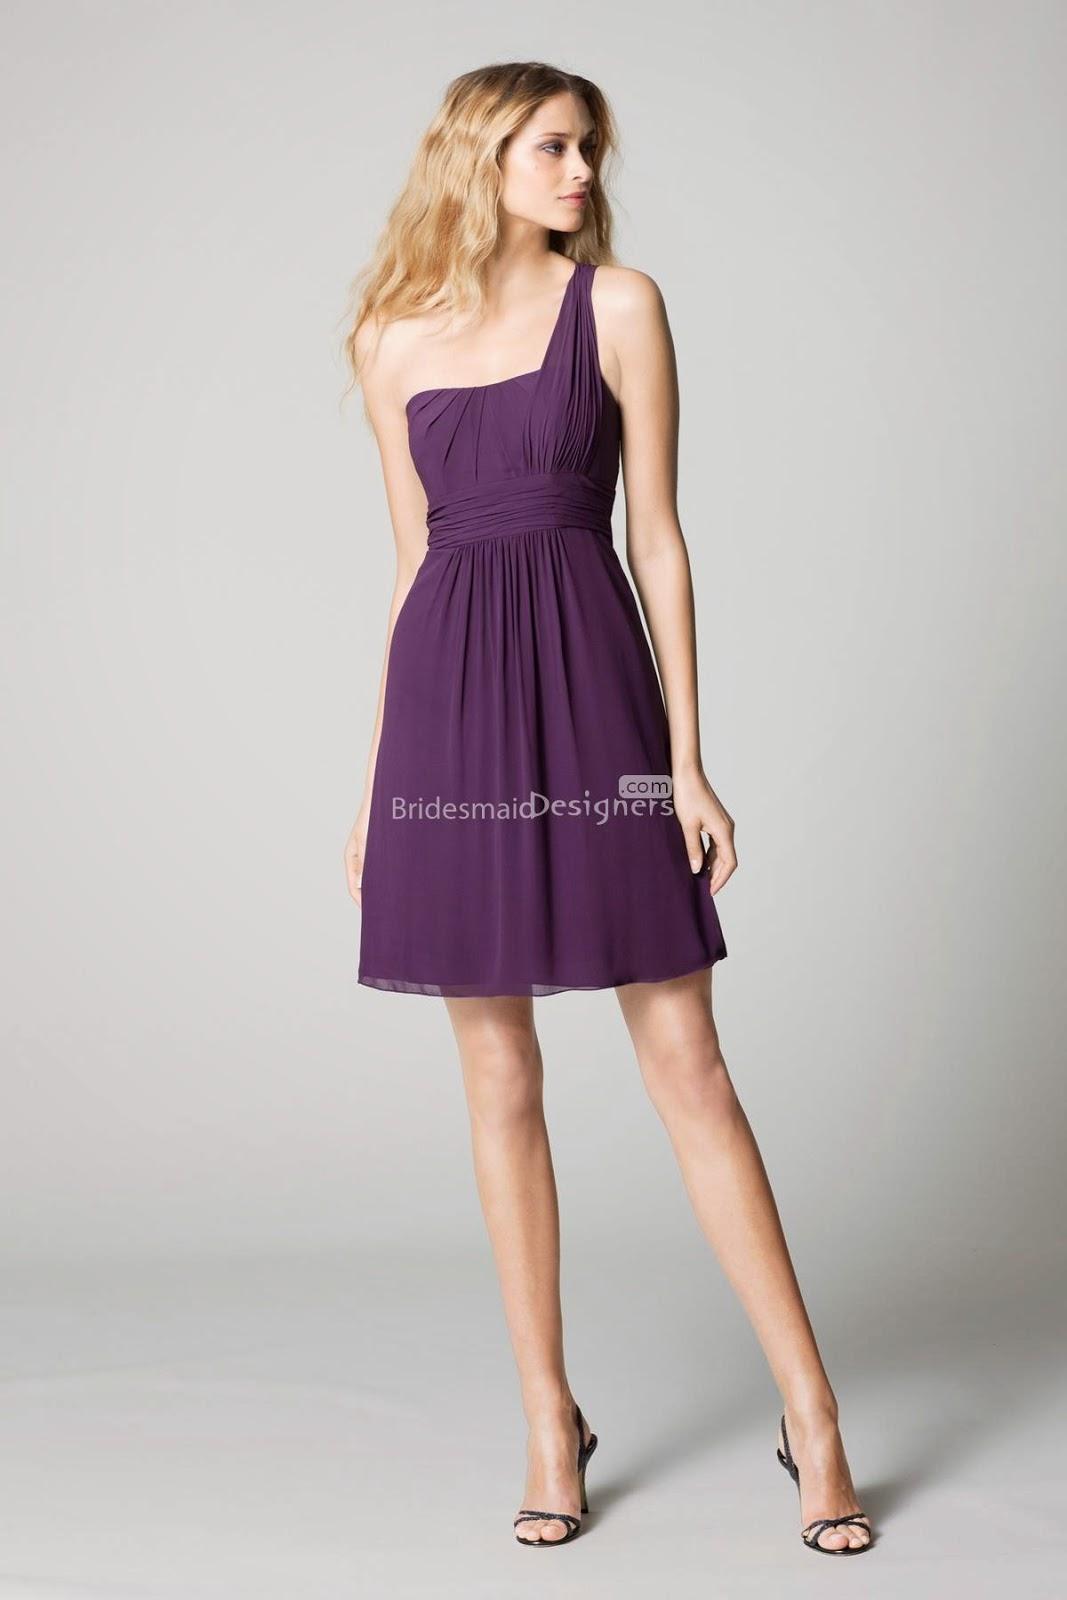 Purple Bridesmaid Dresses & Gowns